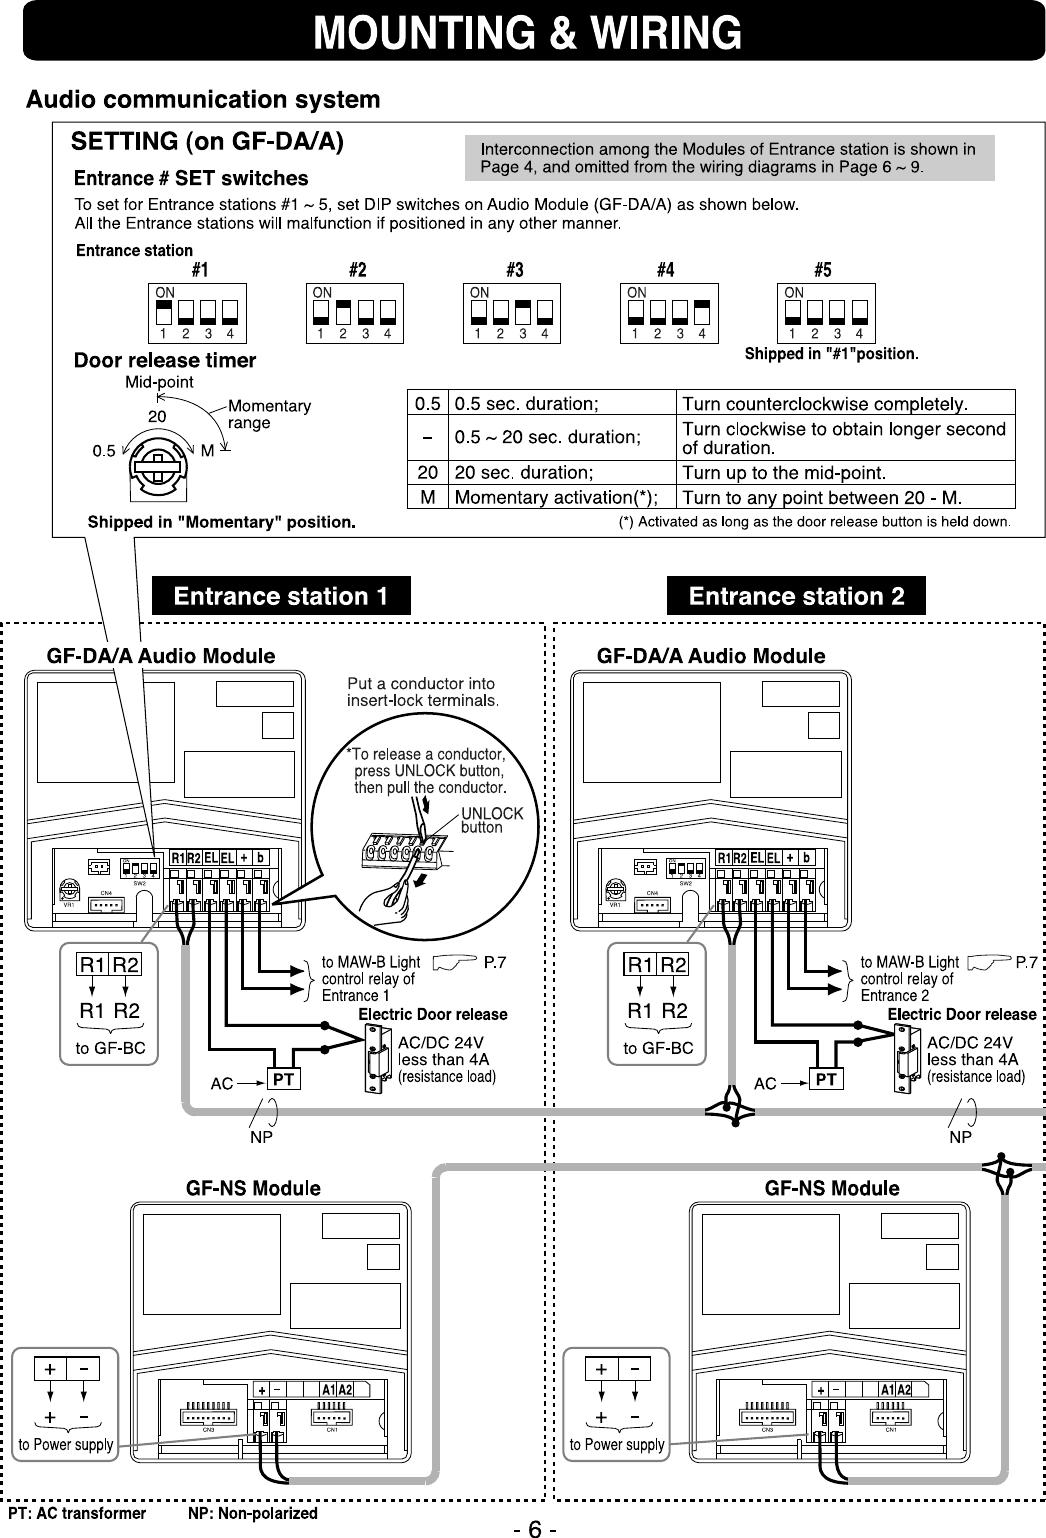 Aiphone Gf 1Md Users Manual 001